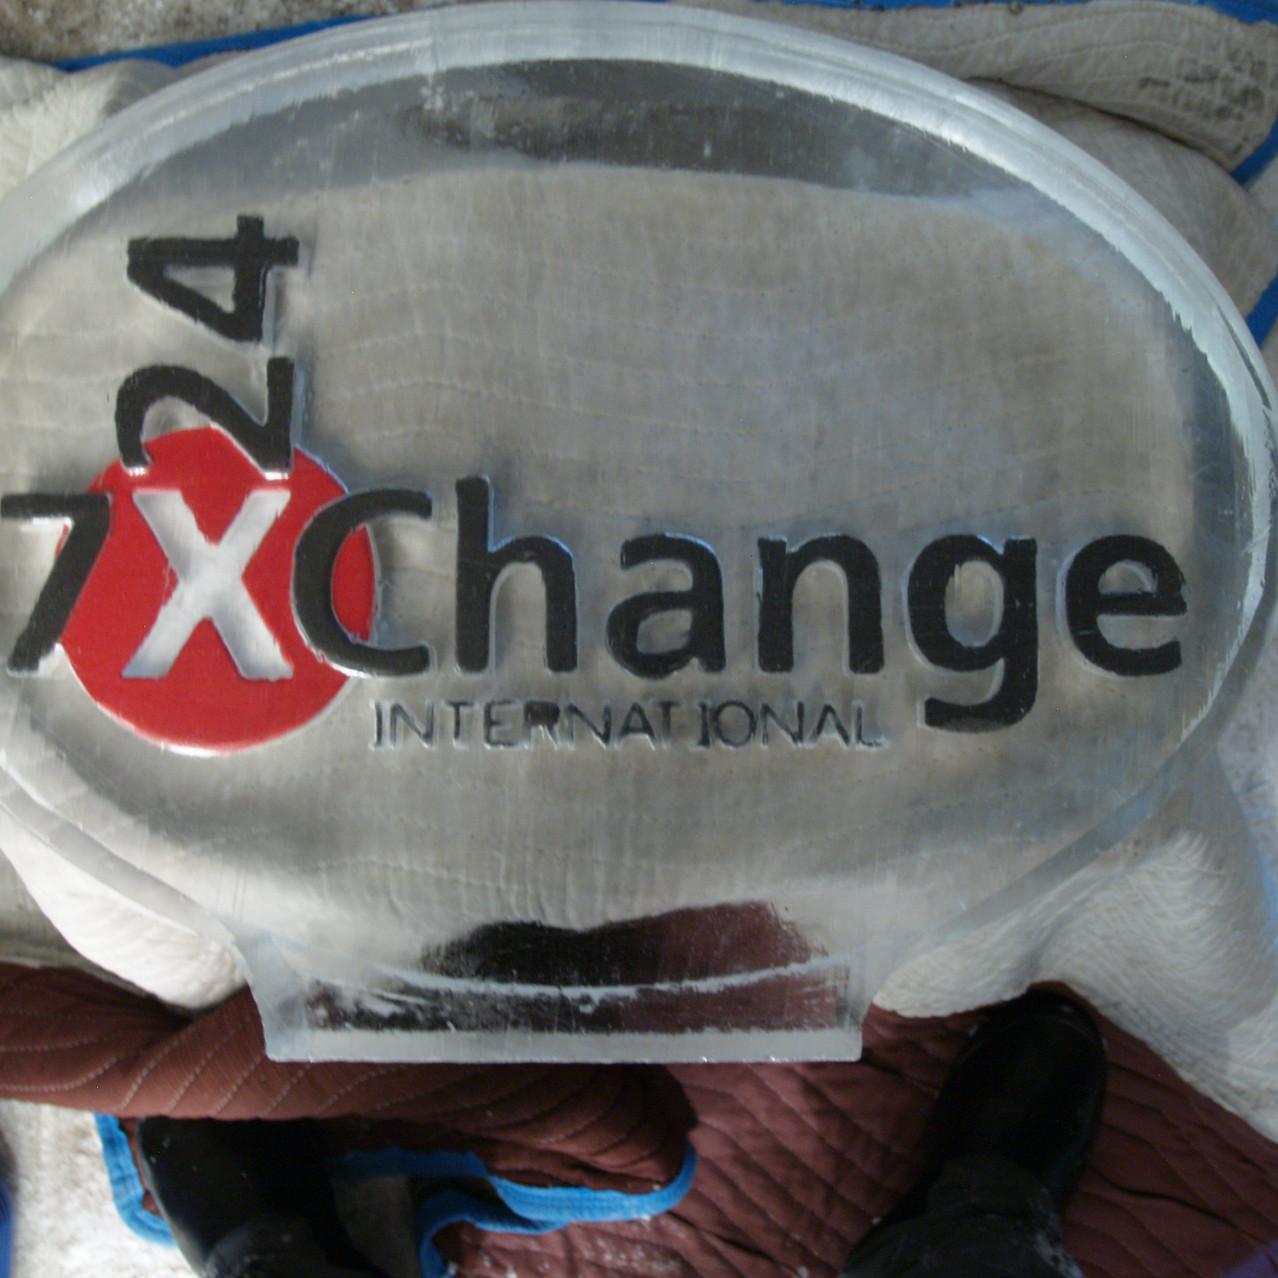 7x24 logo Styled ice.JPG